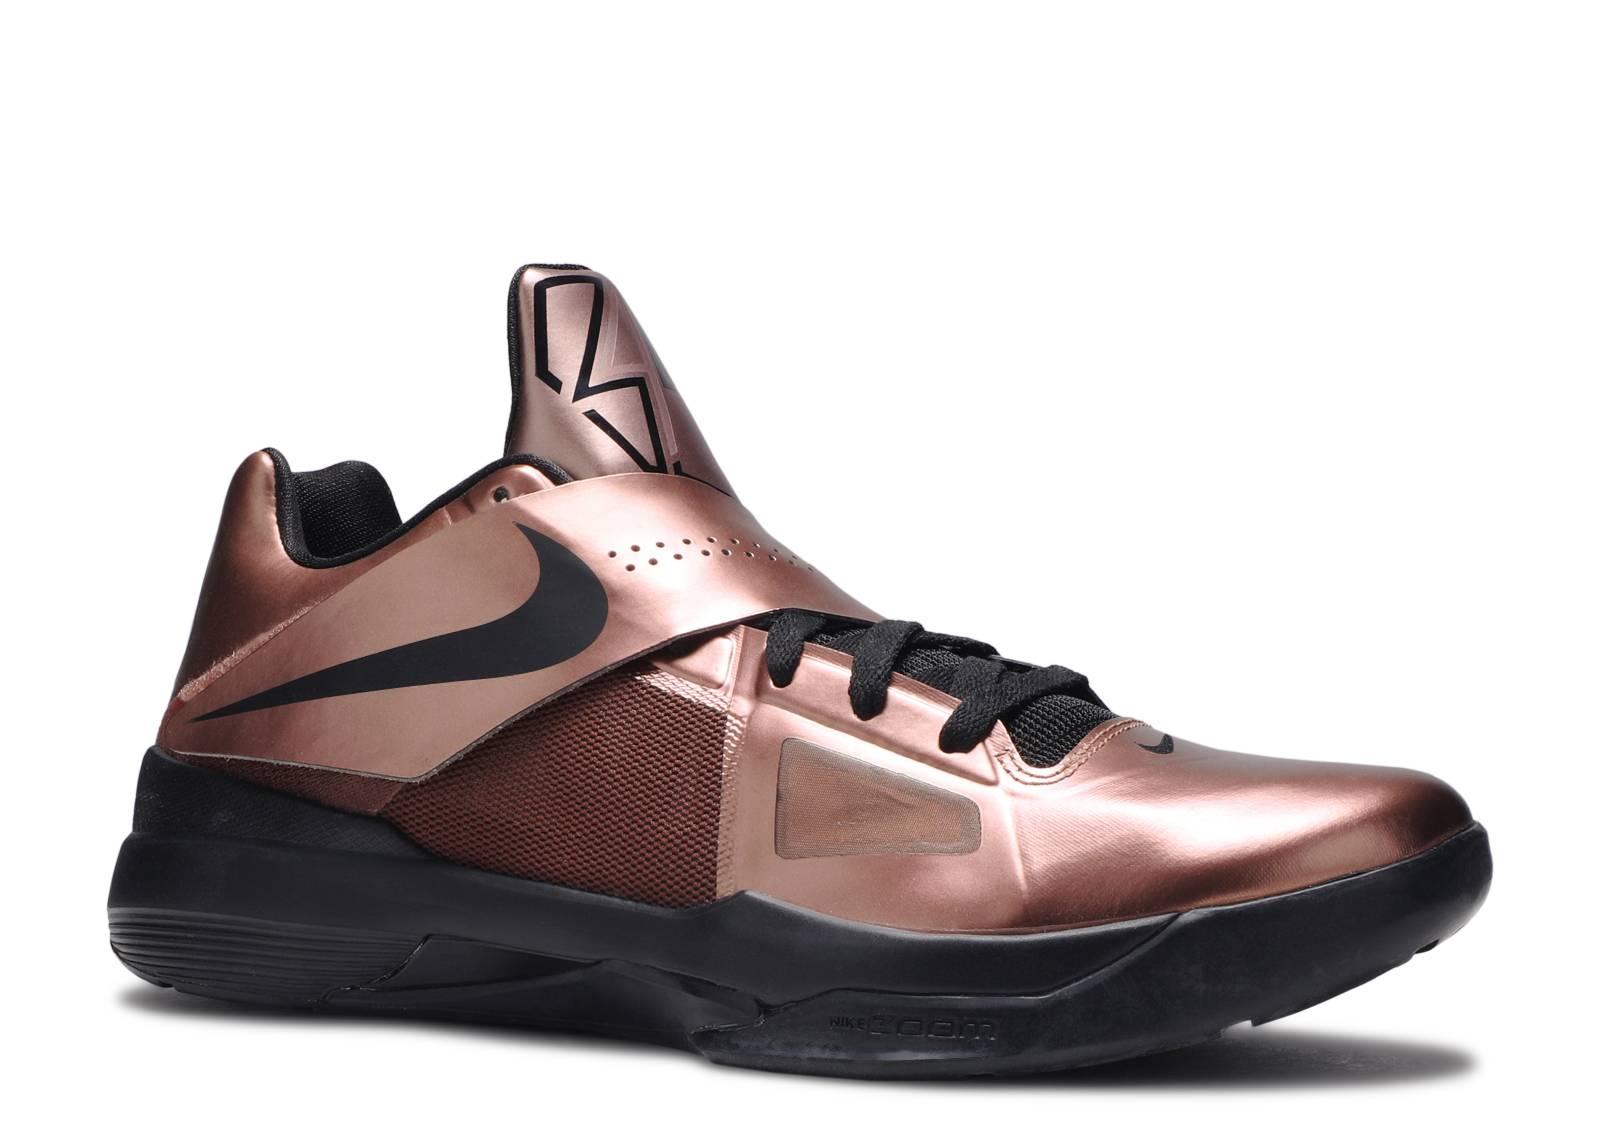 kd 4 bronze